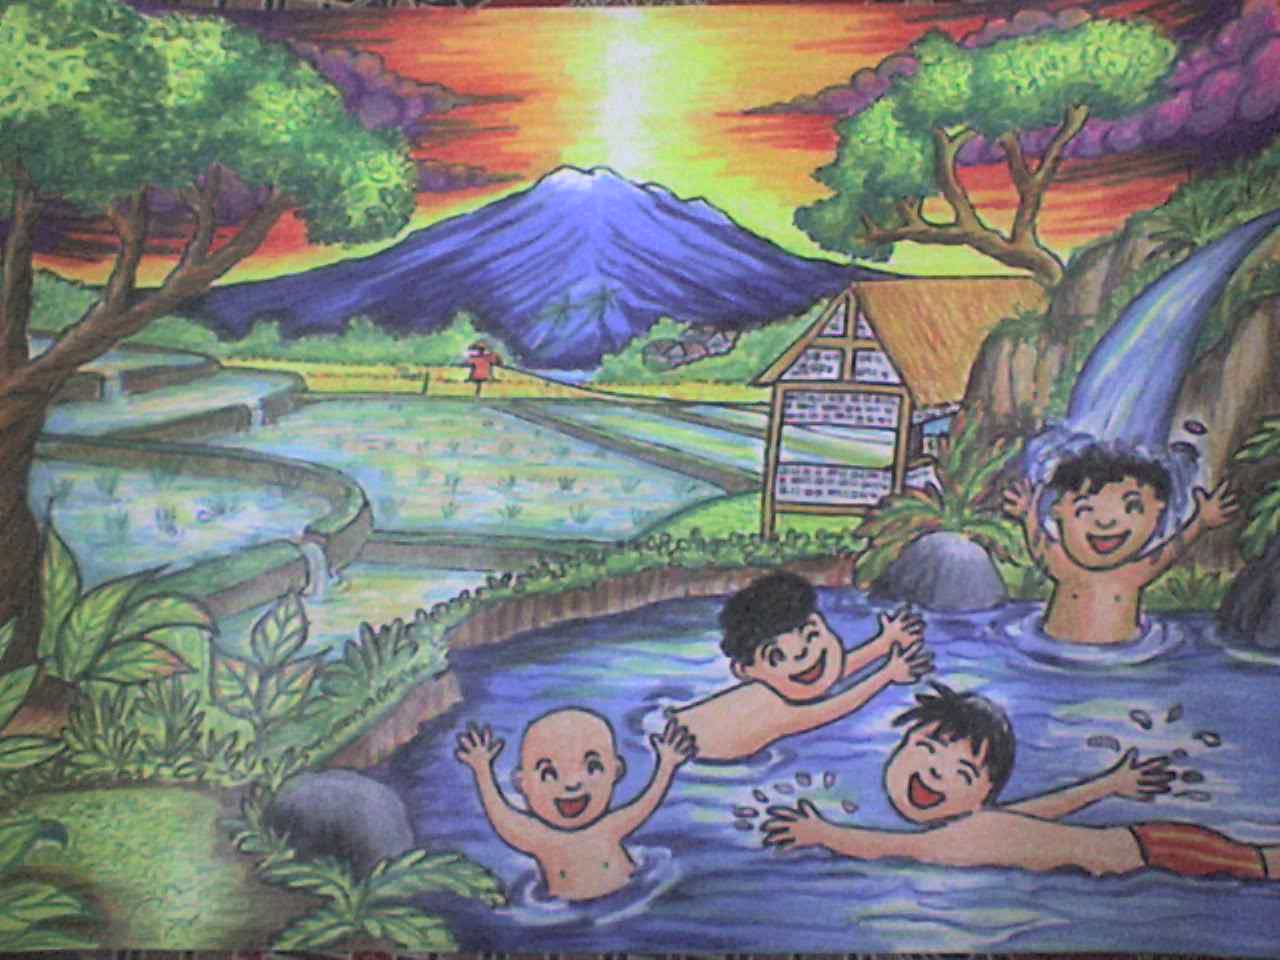 Contoh Lukisan Pemandangan Anak Sd Bliblinews Puisi Pipin Pirmansyah Ceria